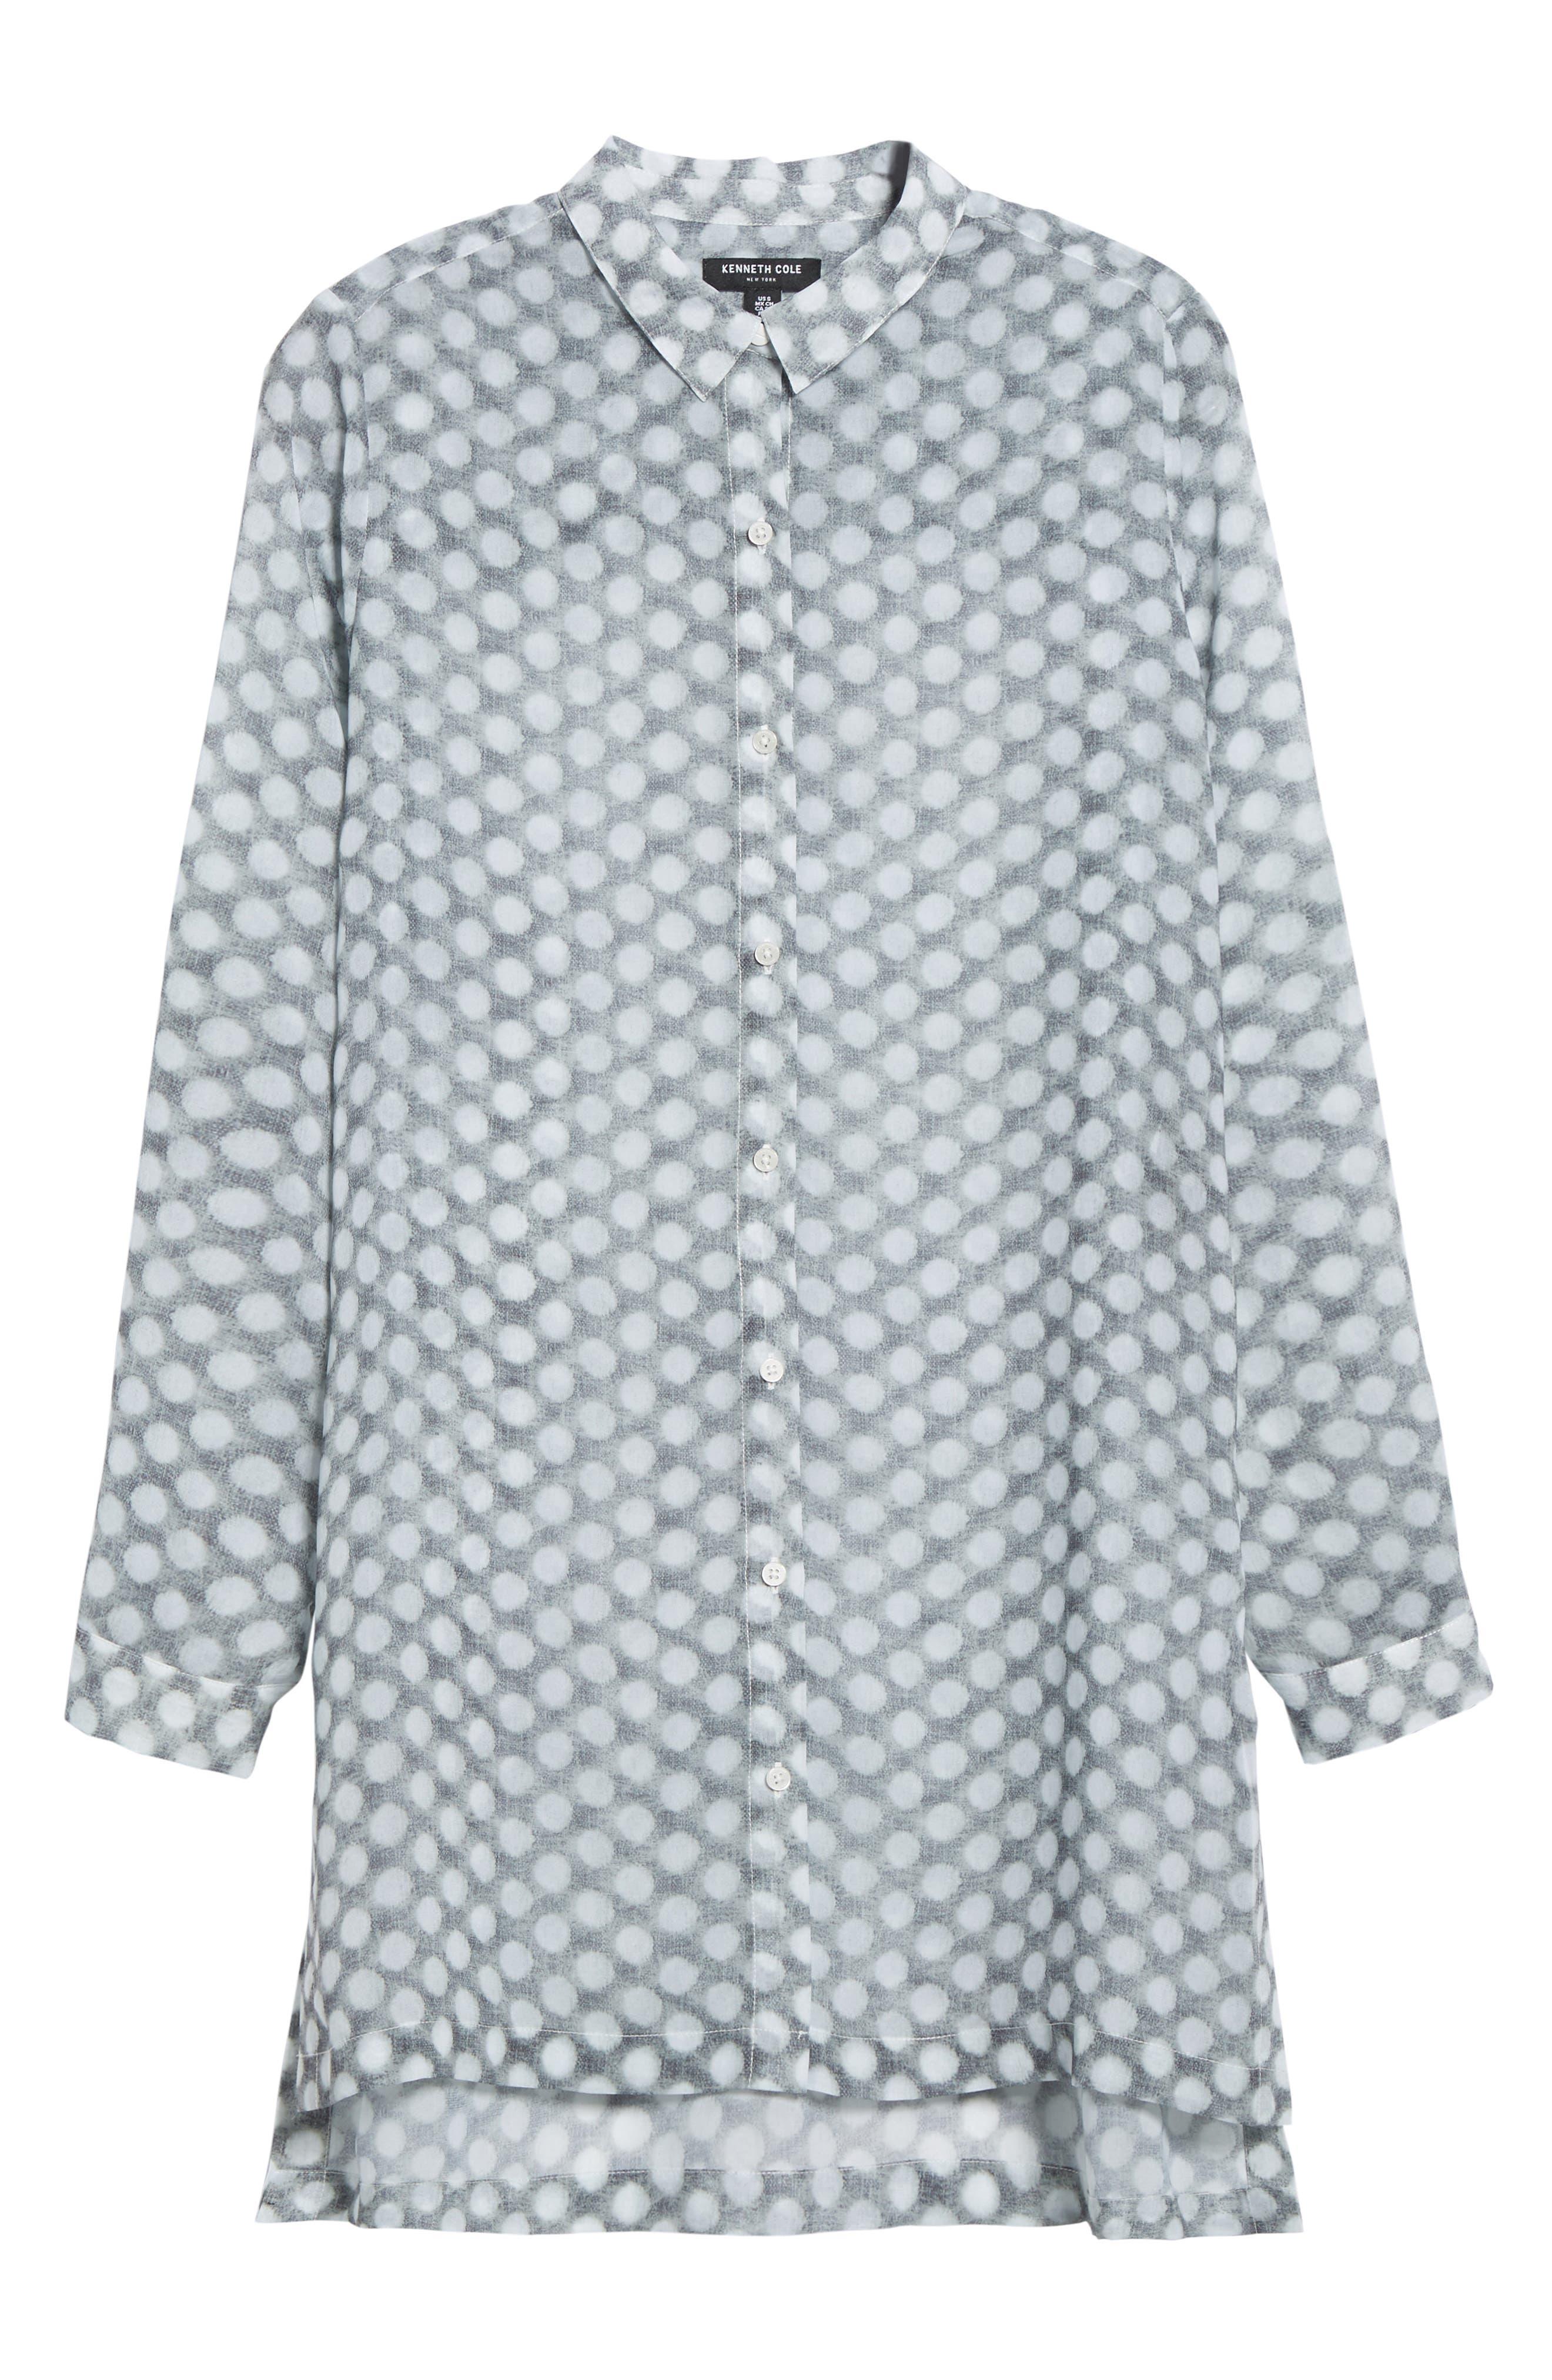 Button Tab Tunic Shirt,                             Alternate thumbnail 6, color,                             Frosty Dot